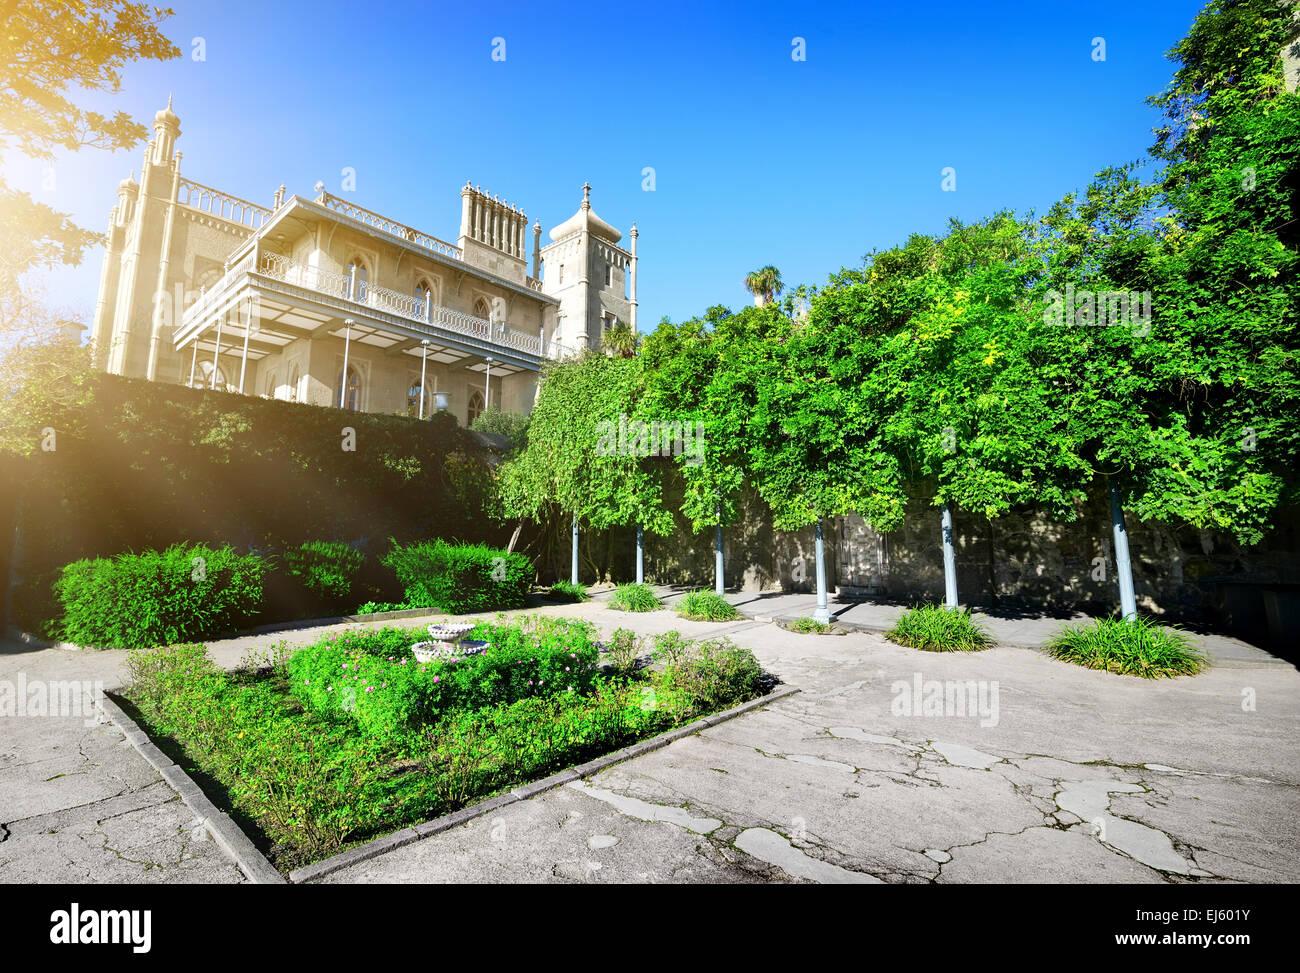 Grüne Blumenbeet in Woronzow Residence am sonnigen Tag Stockbild